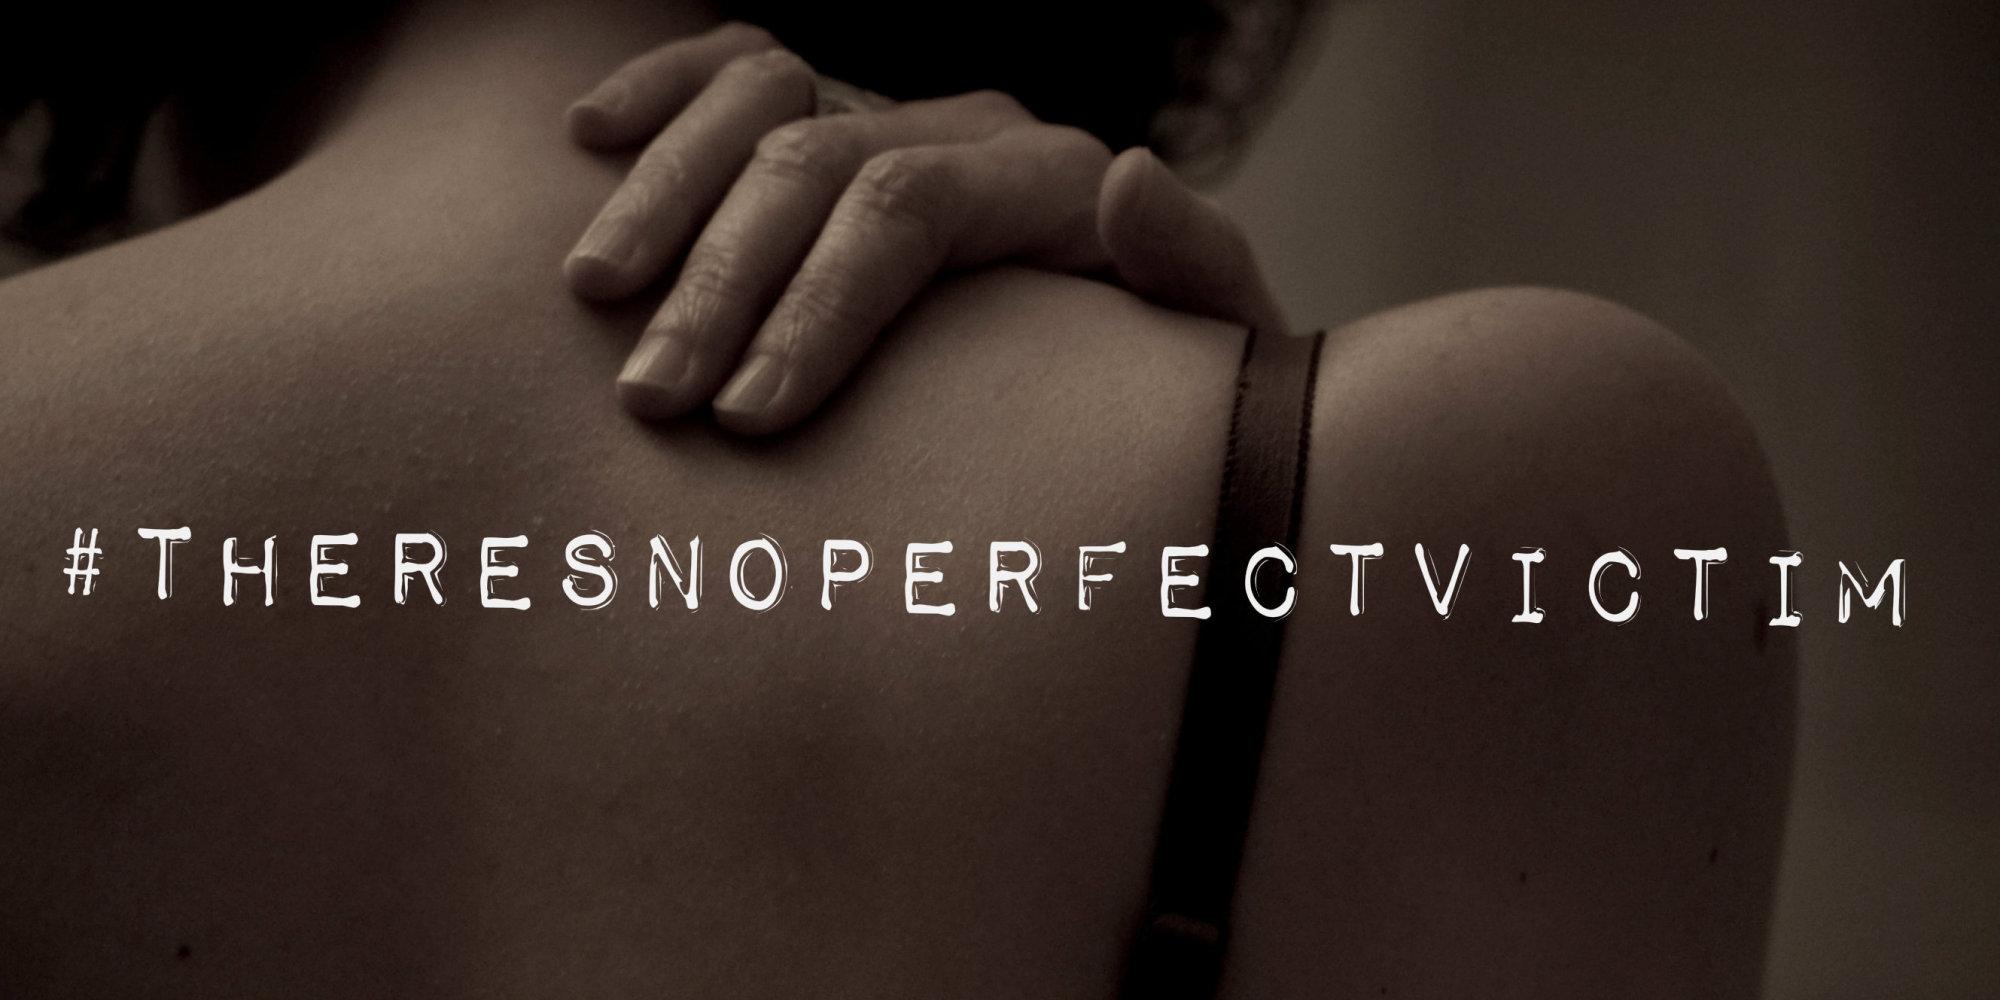 o-NO-PERFECT-VICTIM-facebook.jpg